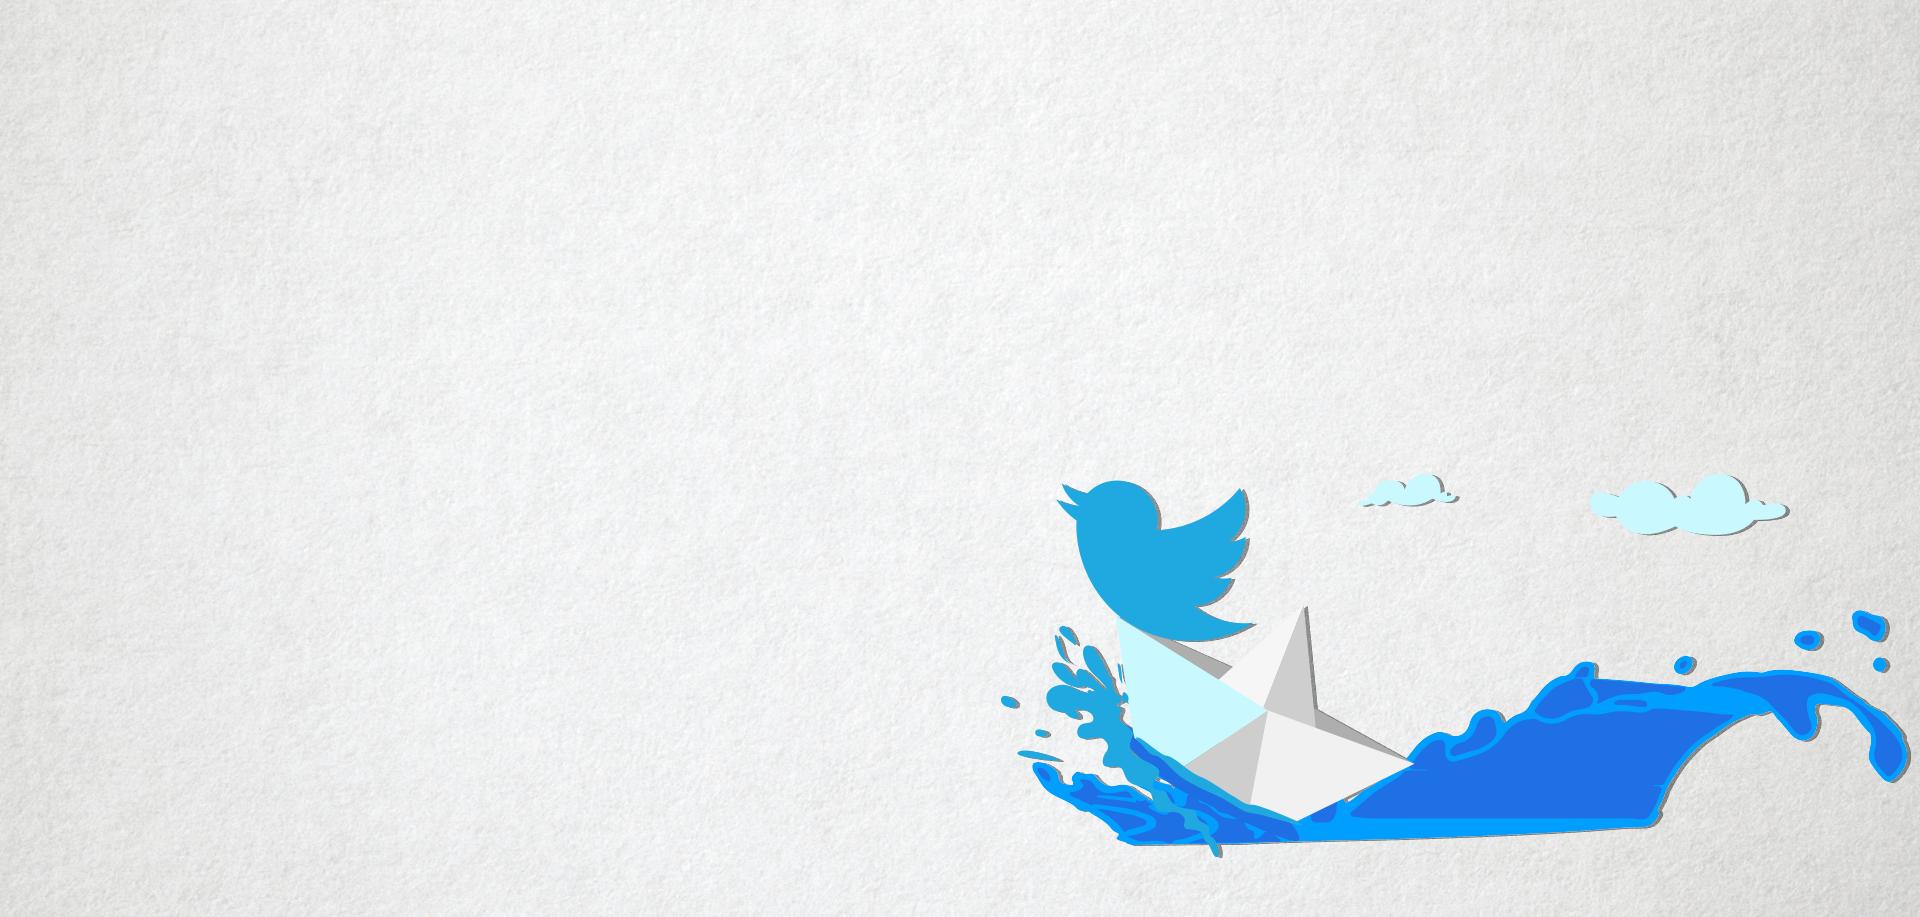 Twitter Trending Services in Mumbai